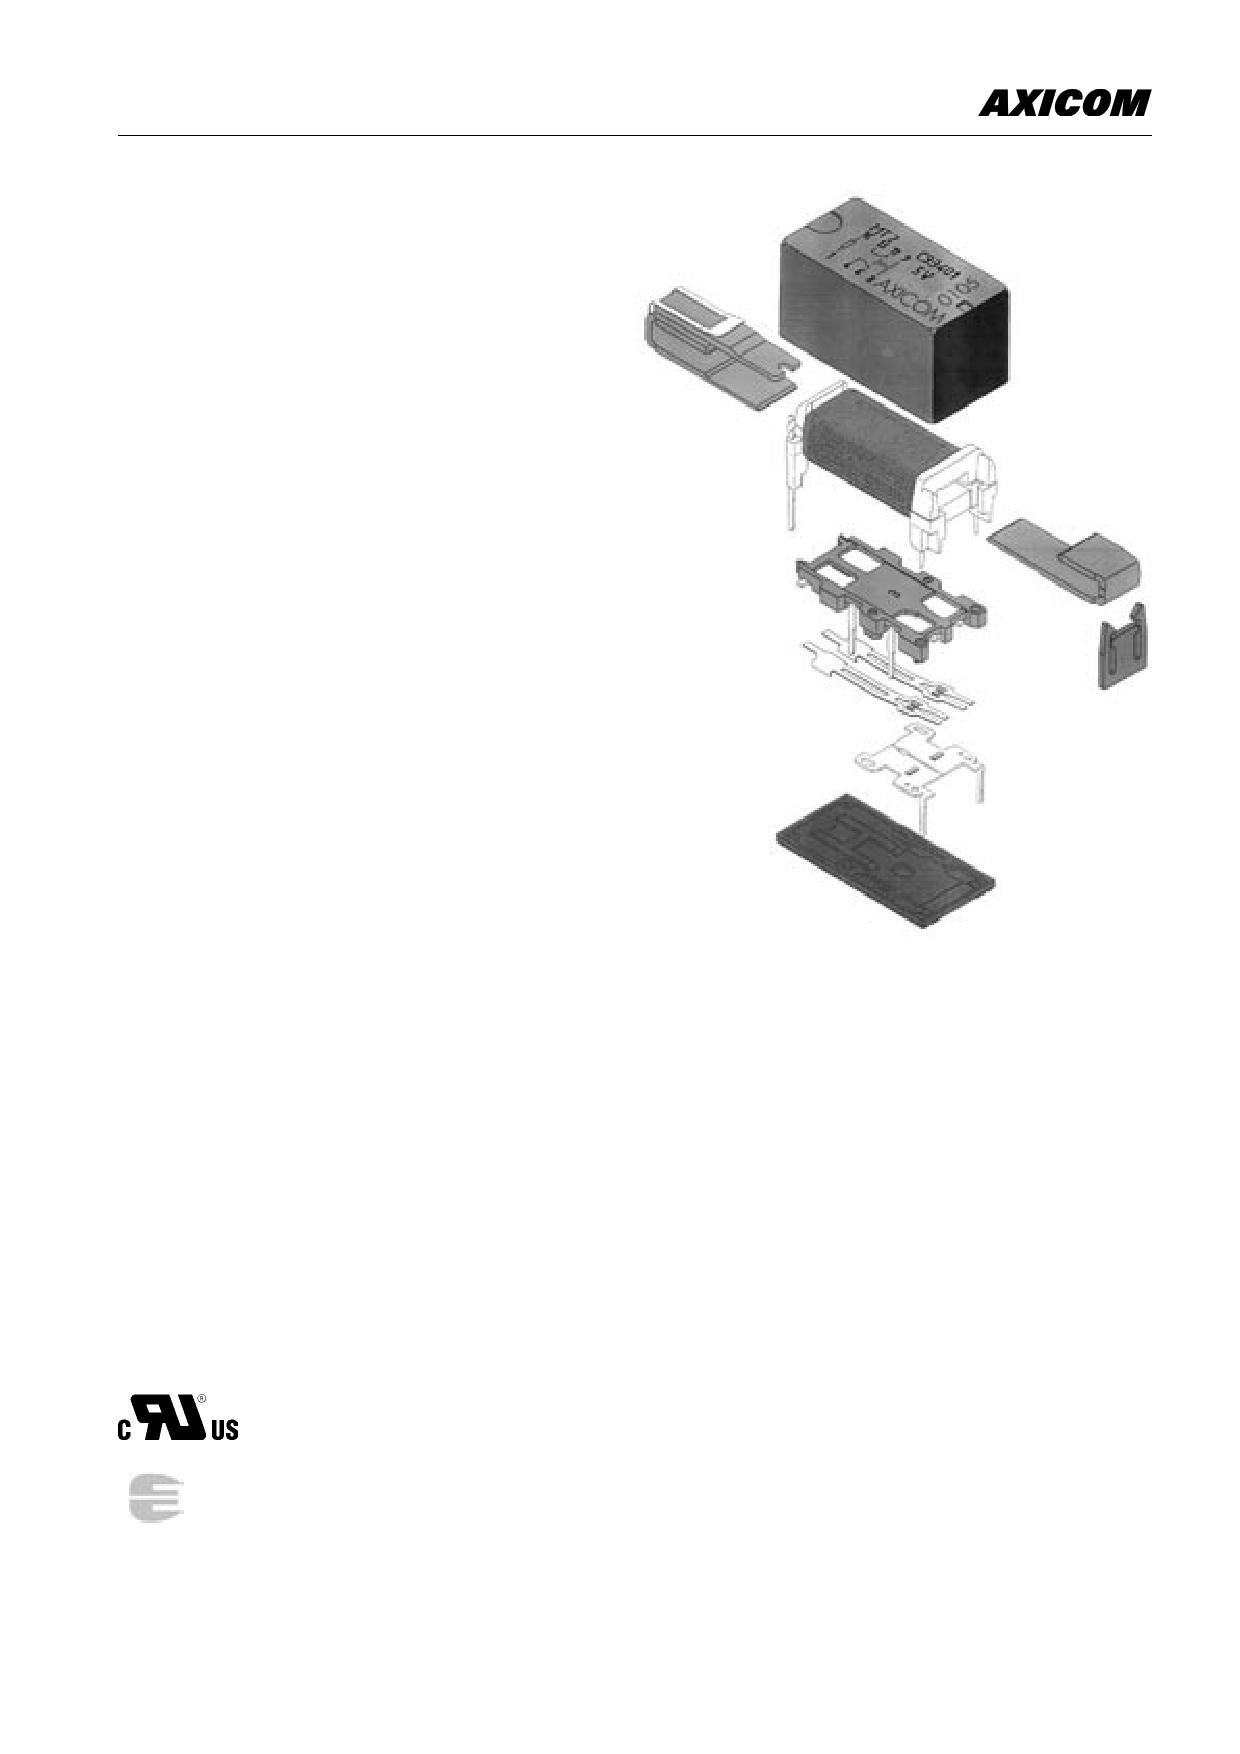 3-1462000-6 Даташит, Описание, Даташиты